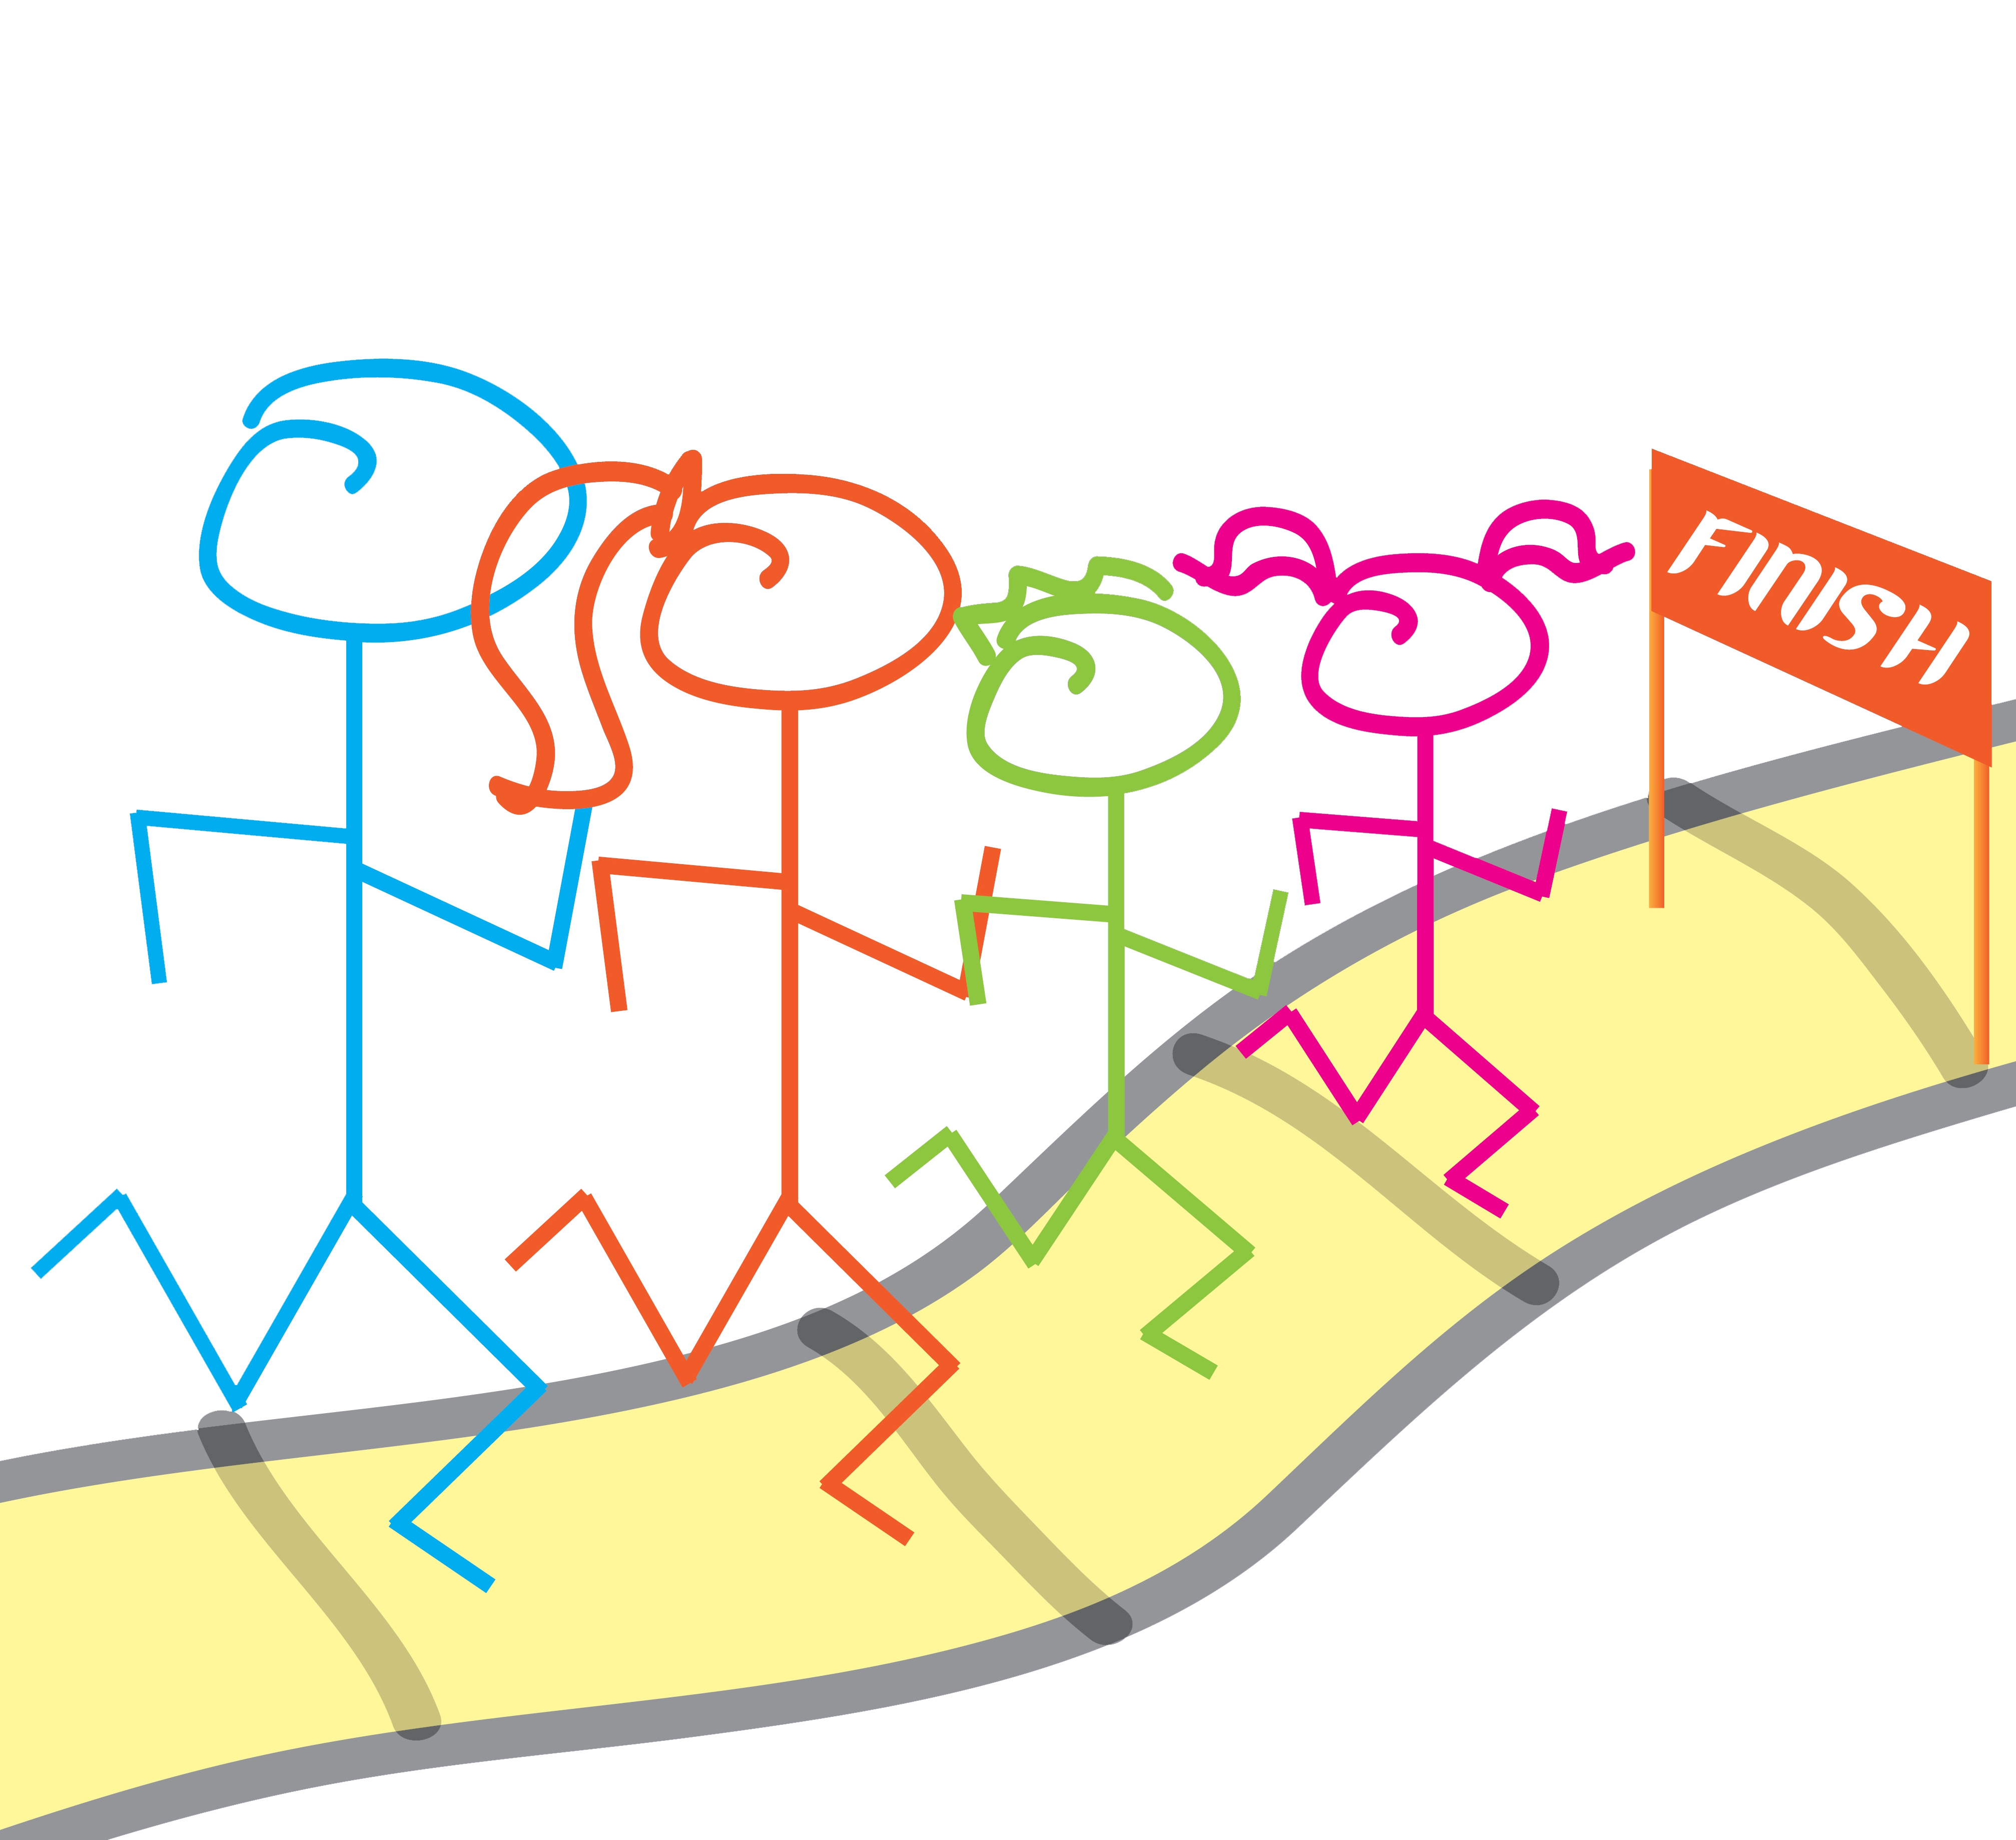 Family Fun Run Clipart#2107483.